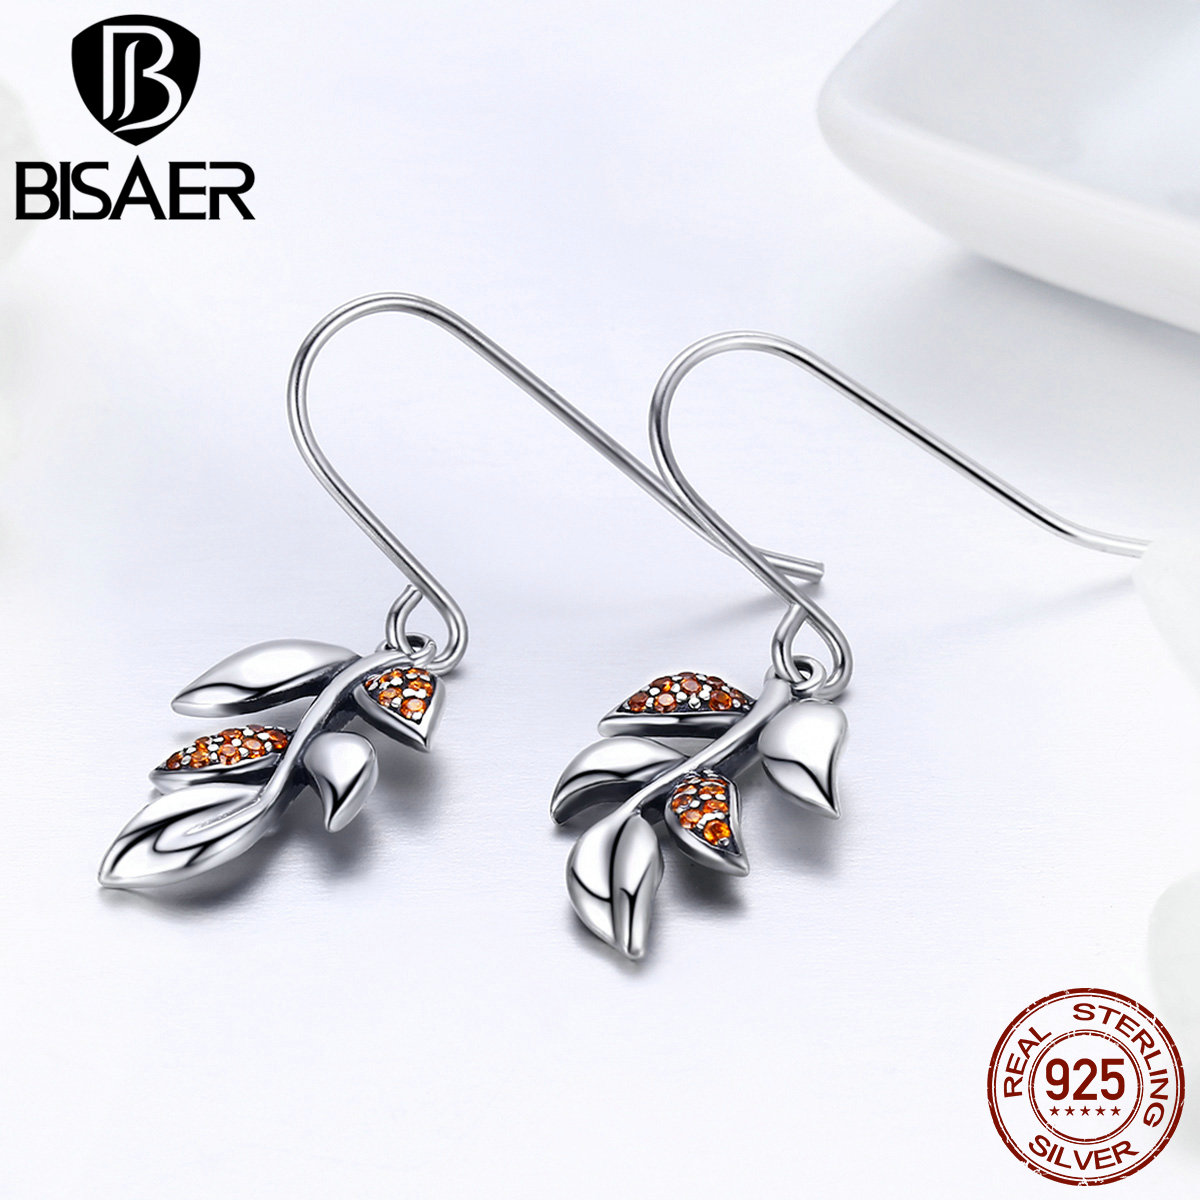 BISAER Genuine 925 Sterling Silver CZ Pave Autumn Elegant Leaf Long Drop Earrings for Women Silver Earrings Fine Jewelry GXE374